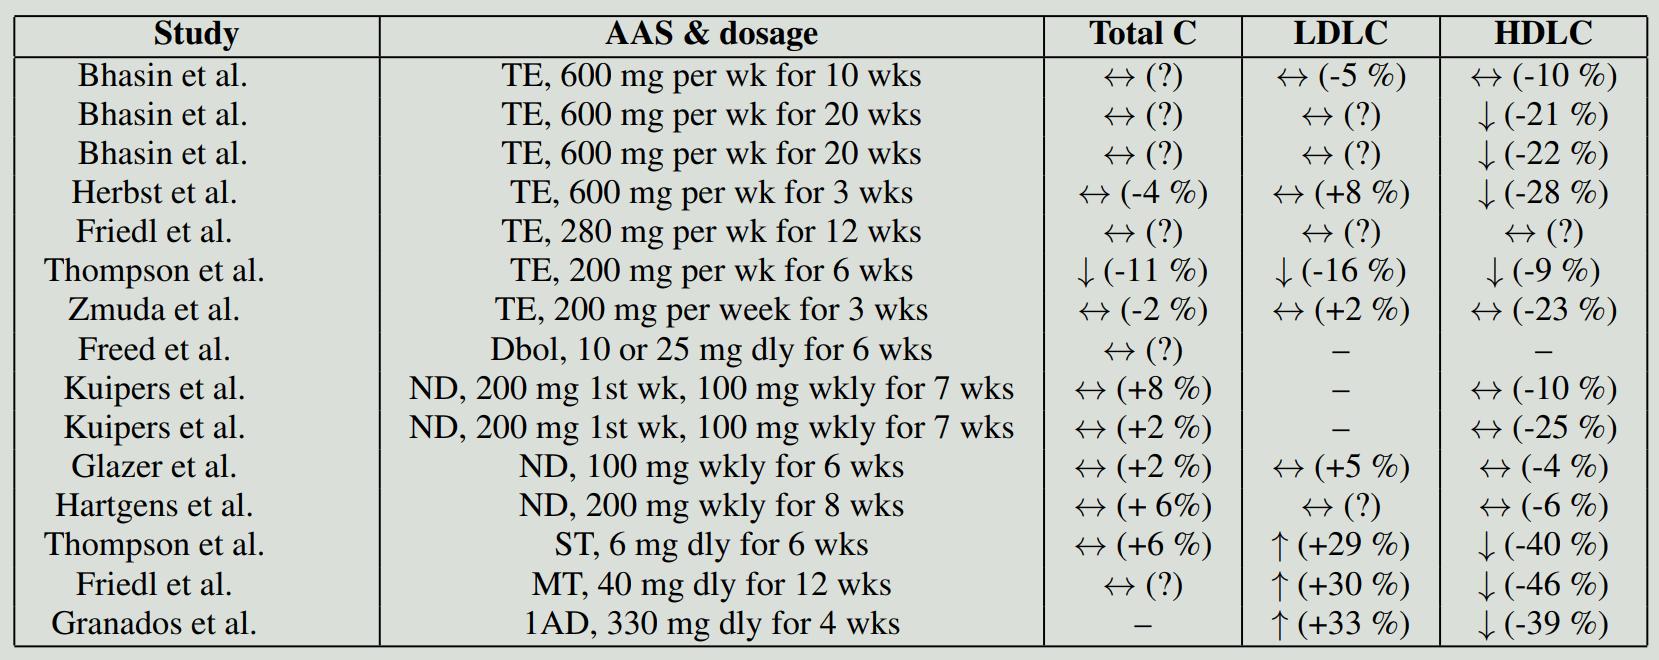 Effect of anabolic steroids on blood lipids